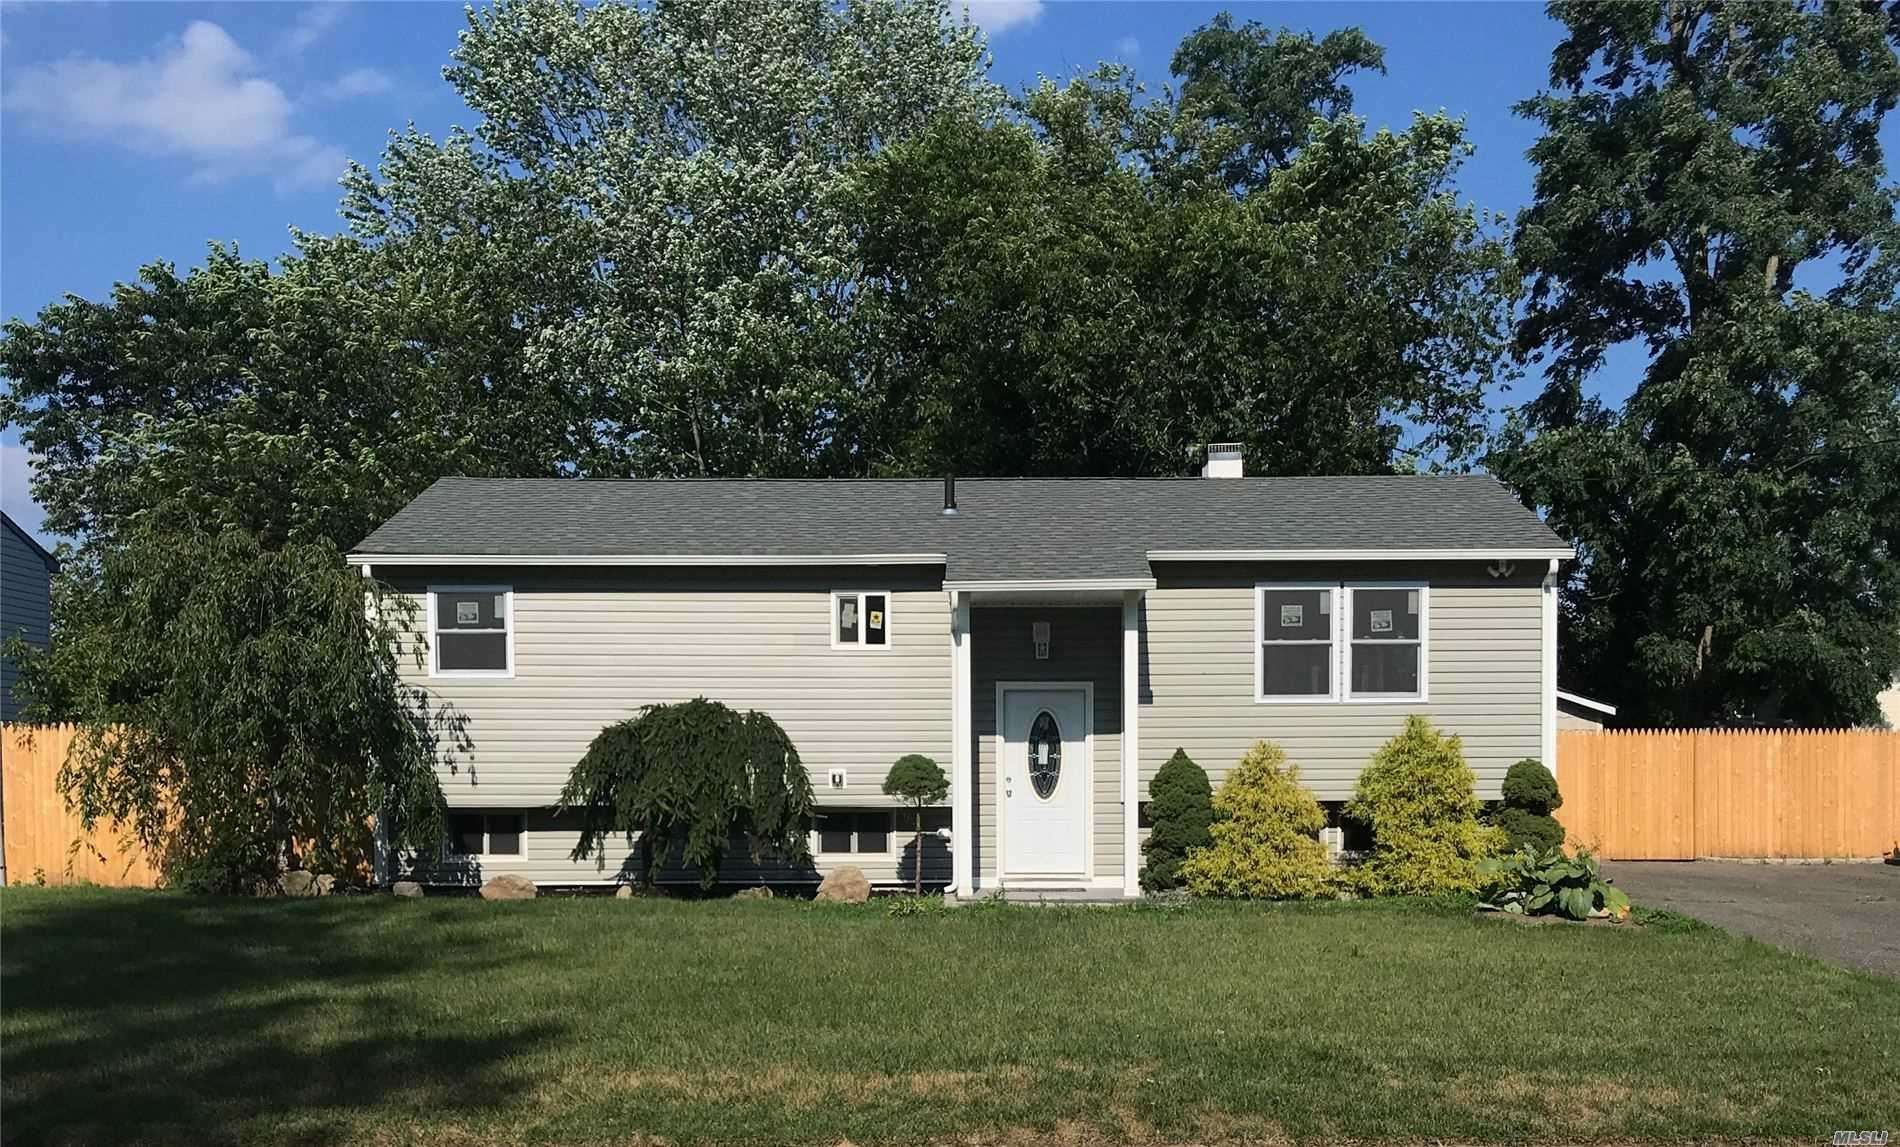 3103 Sipp Ave, Medford, NY 11763 - MLS#: 3232050